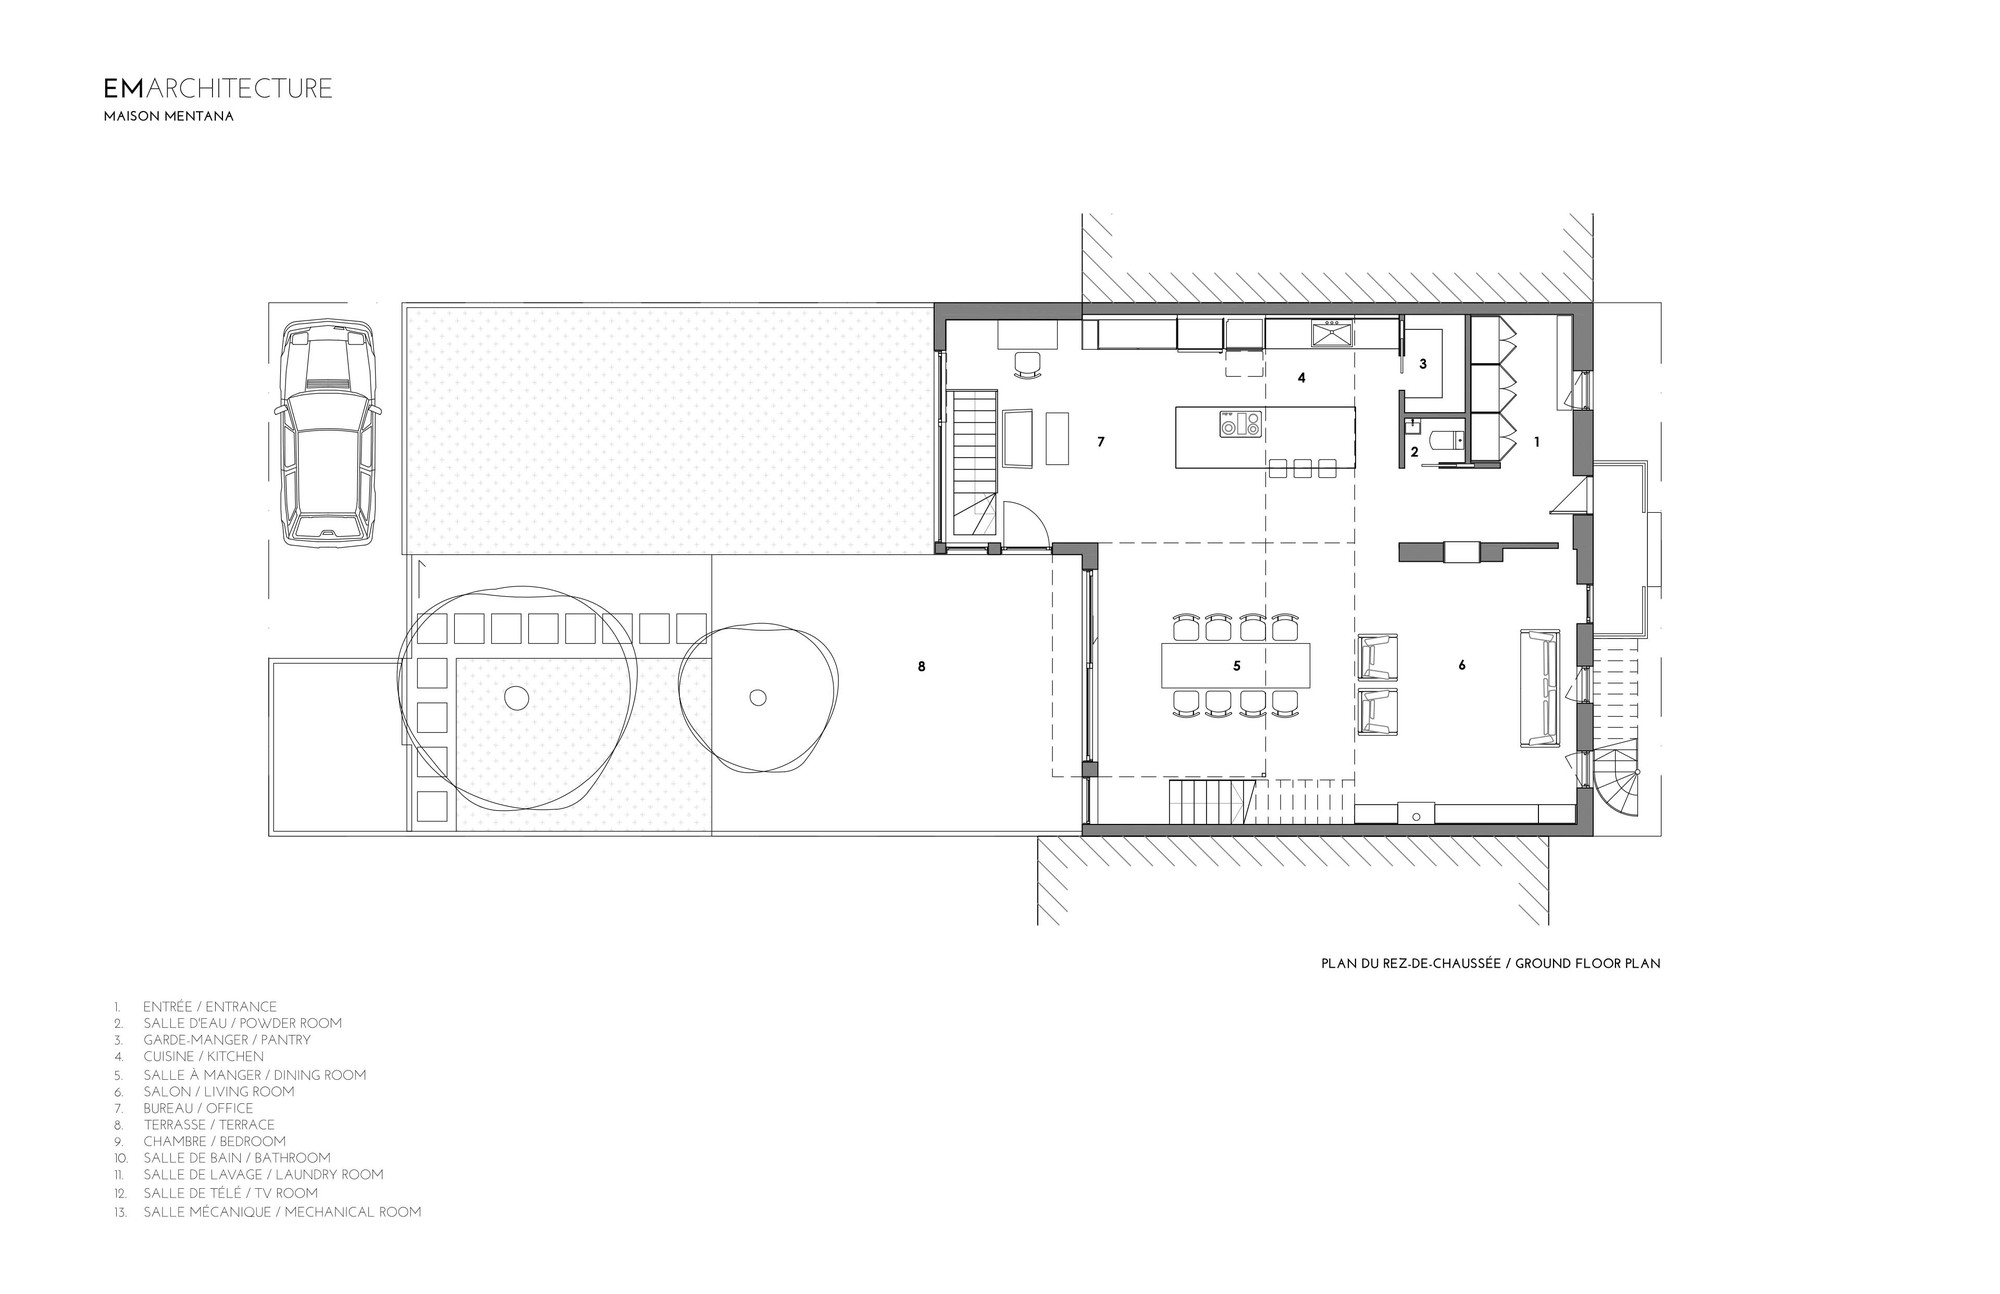 floor plan - Plan Architecture Maison 100m2